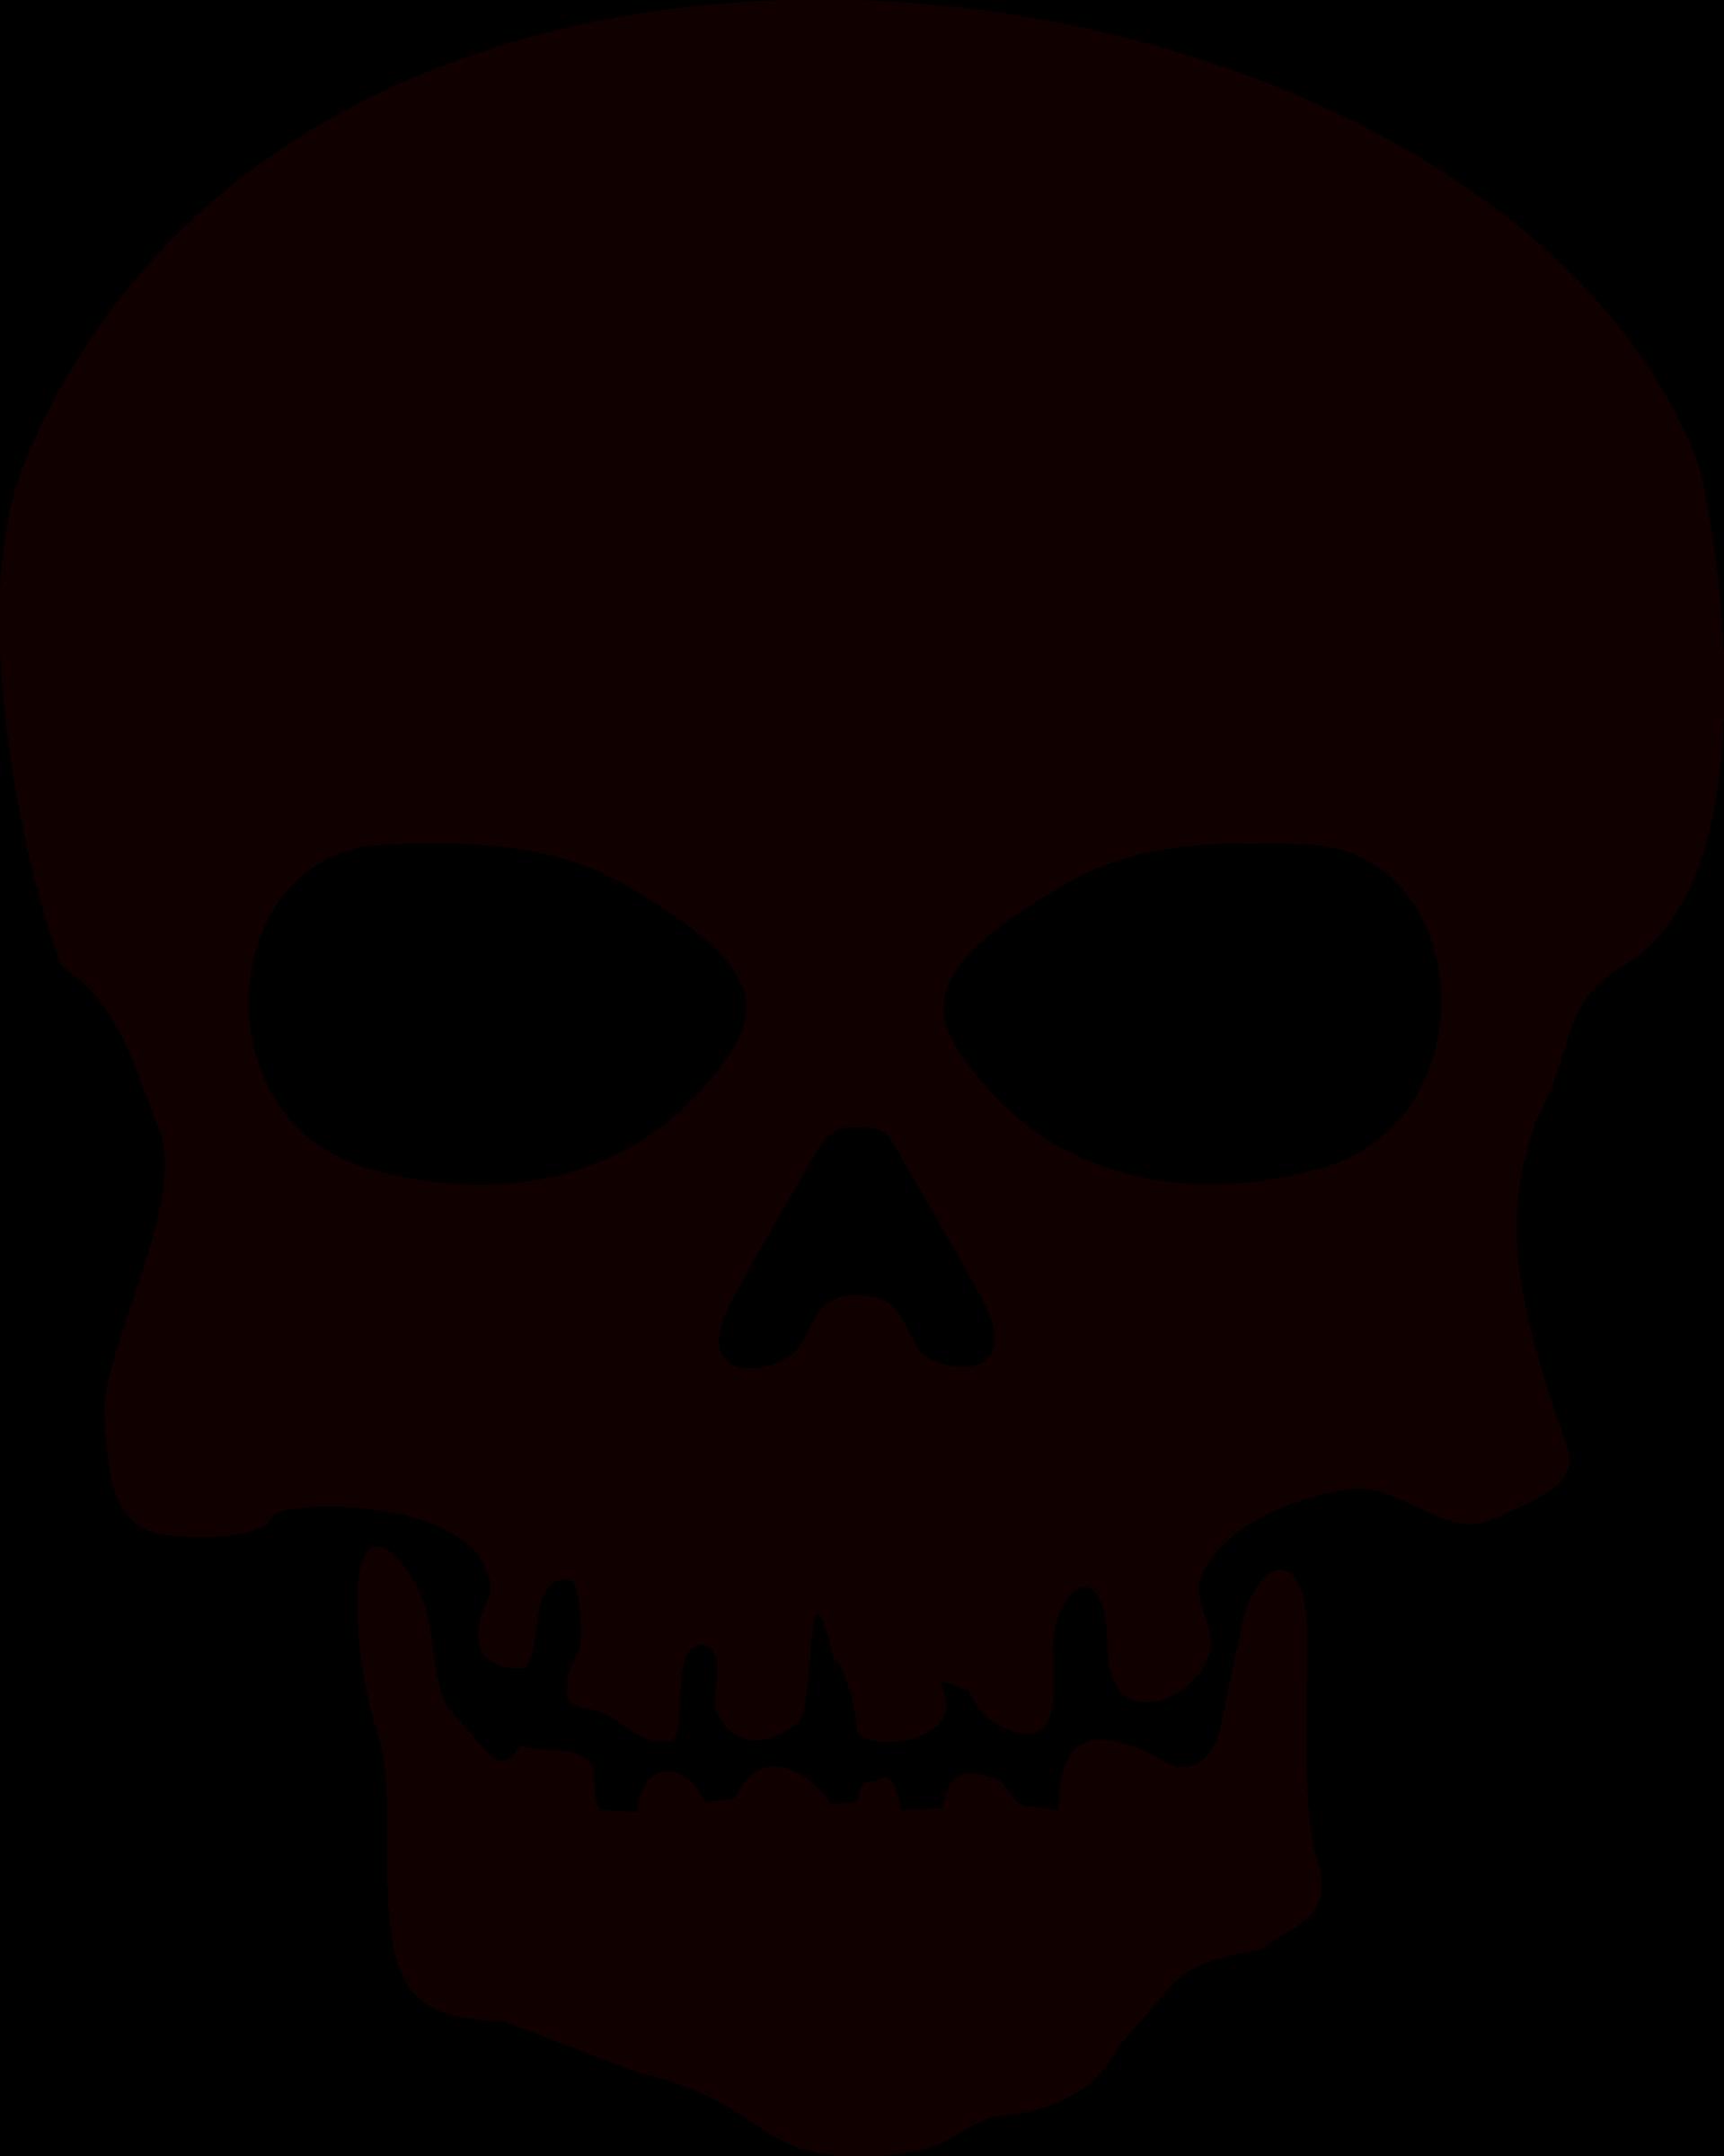 Coffin clipart halloween skeleton. The best art images